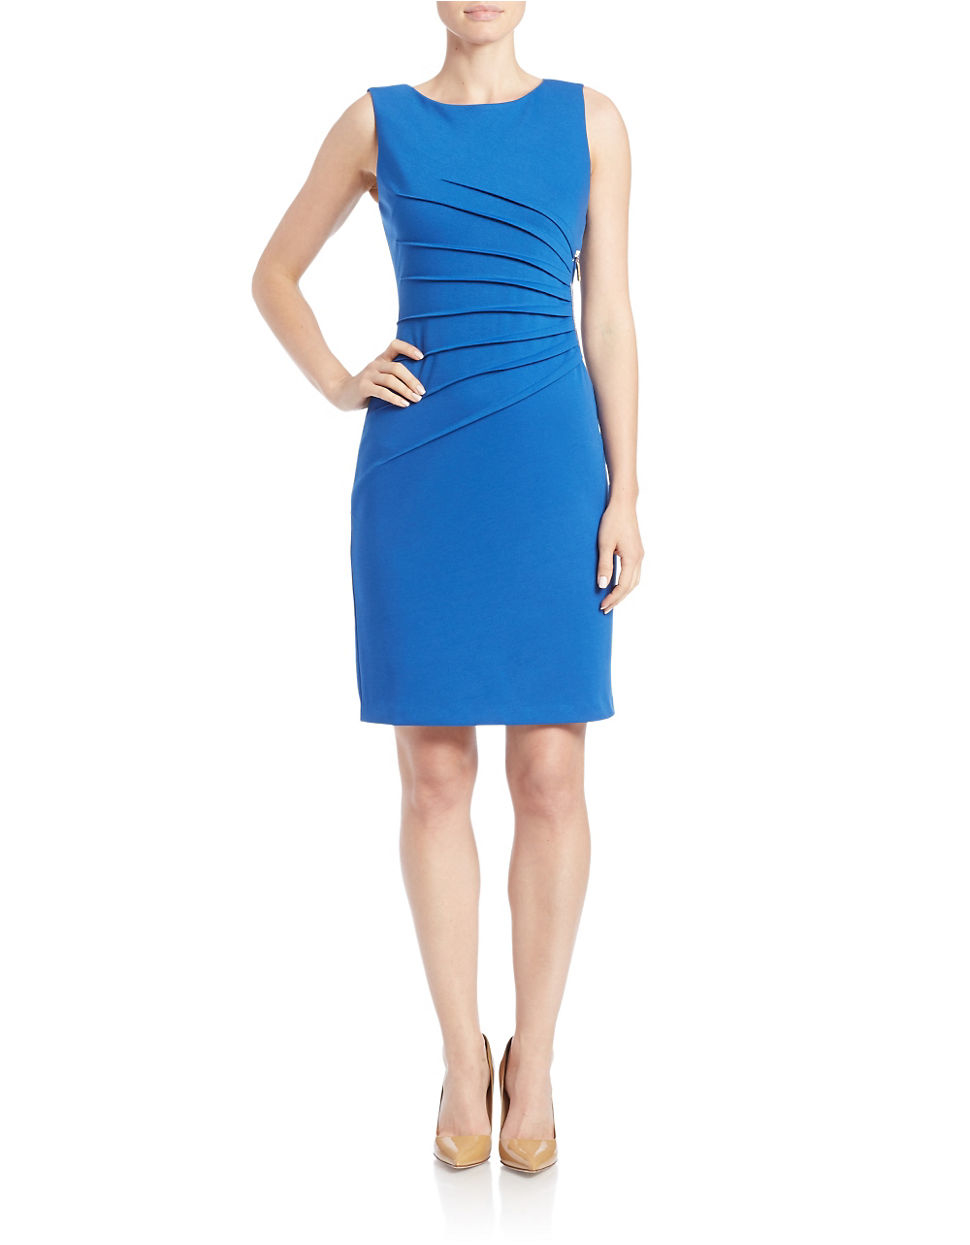 Ivanka Trump Blue Sunburst Side Pleat Dress Lyst